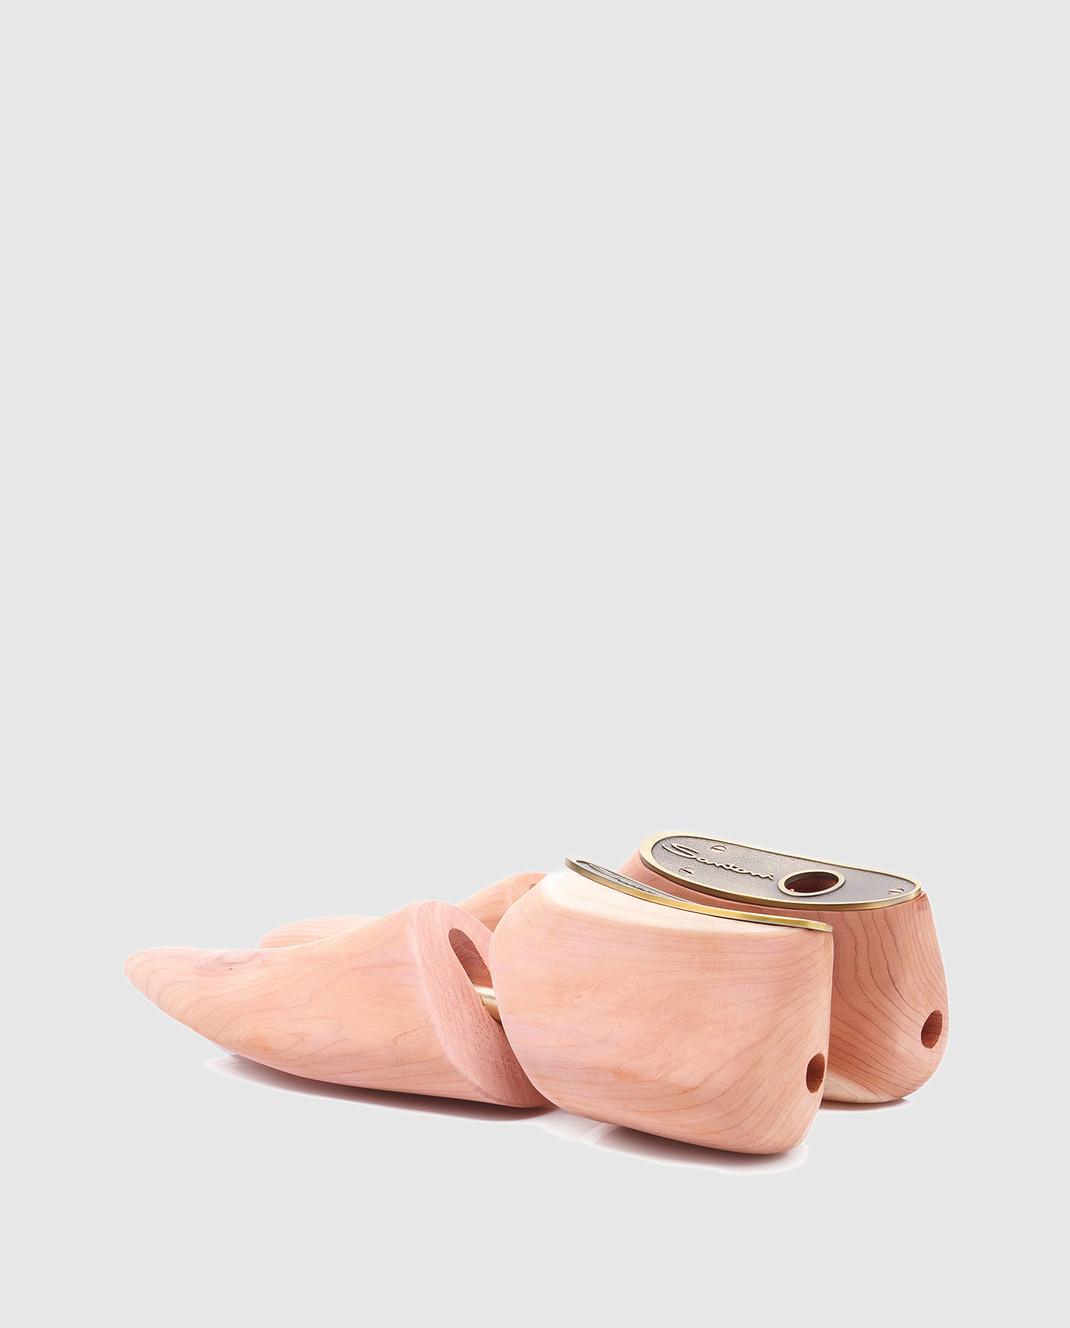 Santoni Бежевая колодка для обуви  из кедра UFAAA1069 изображение 3